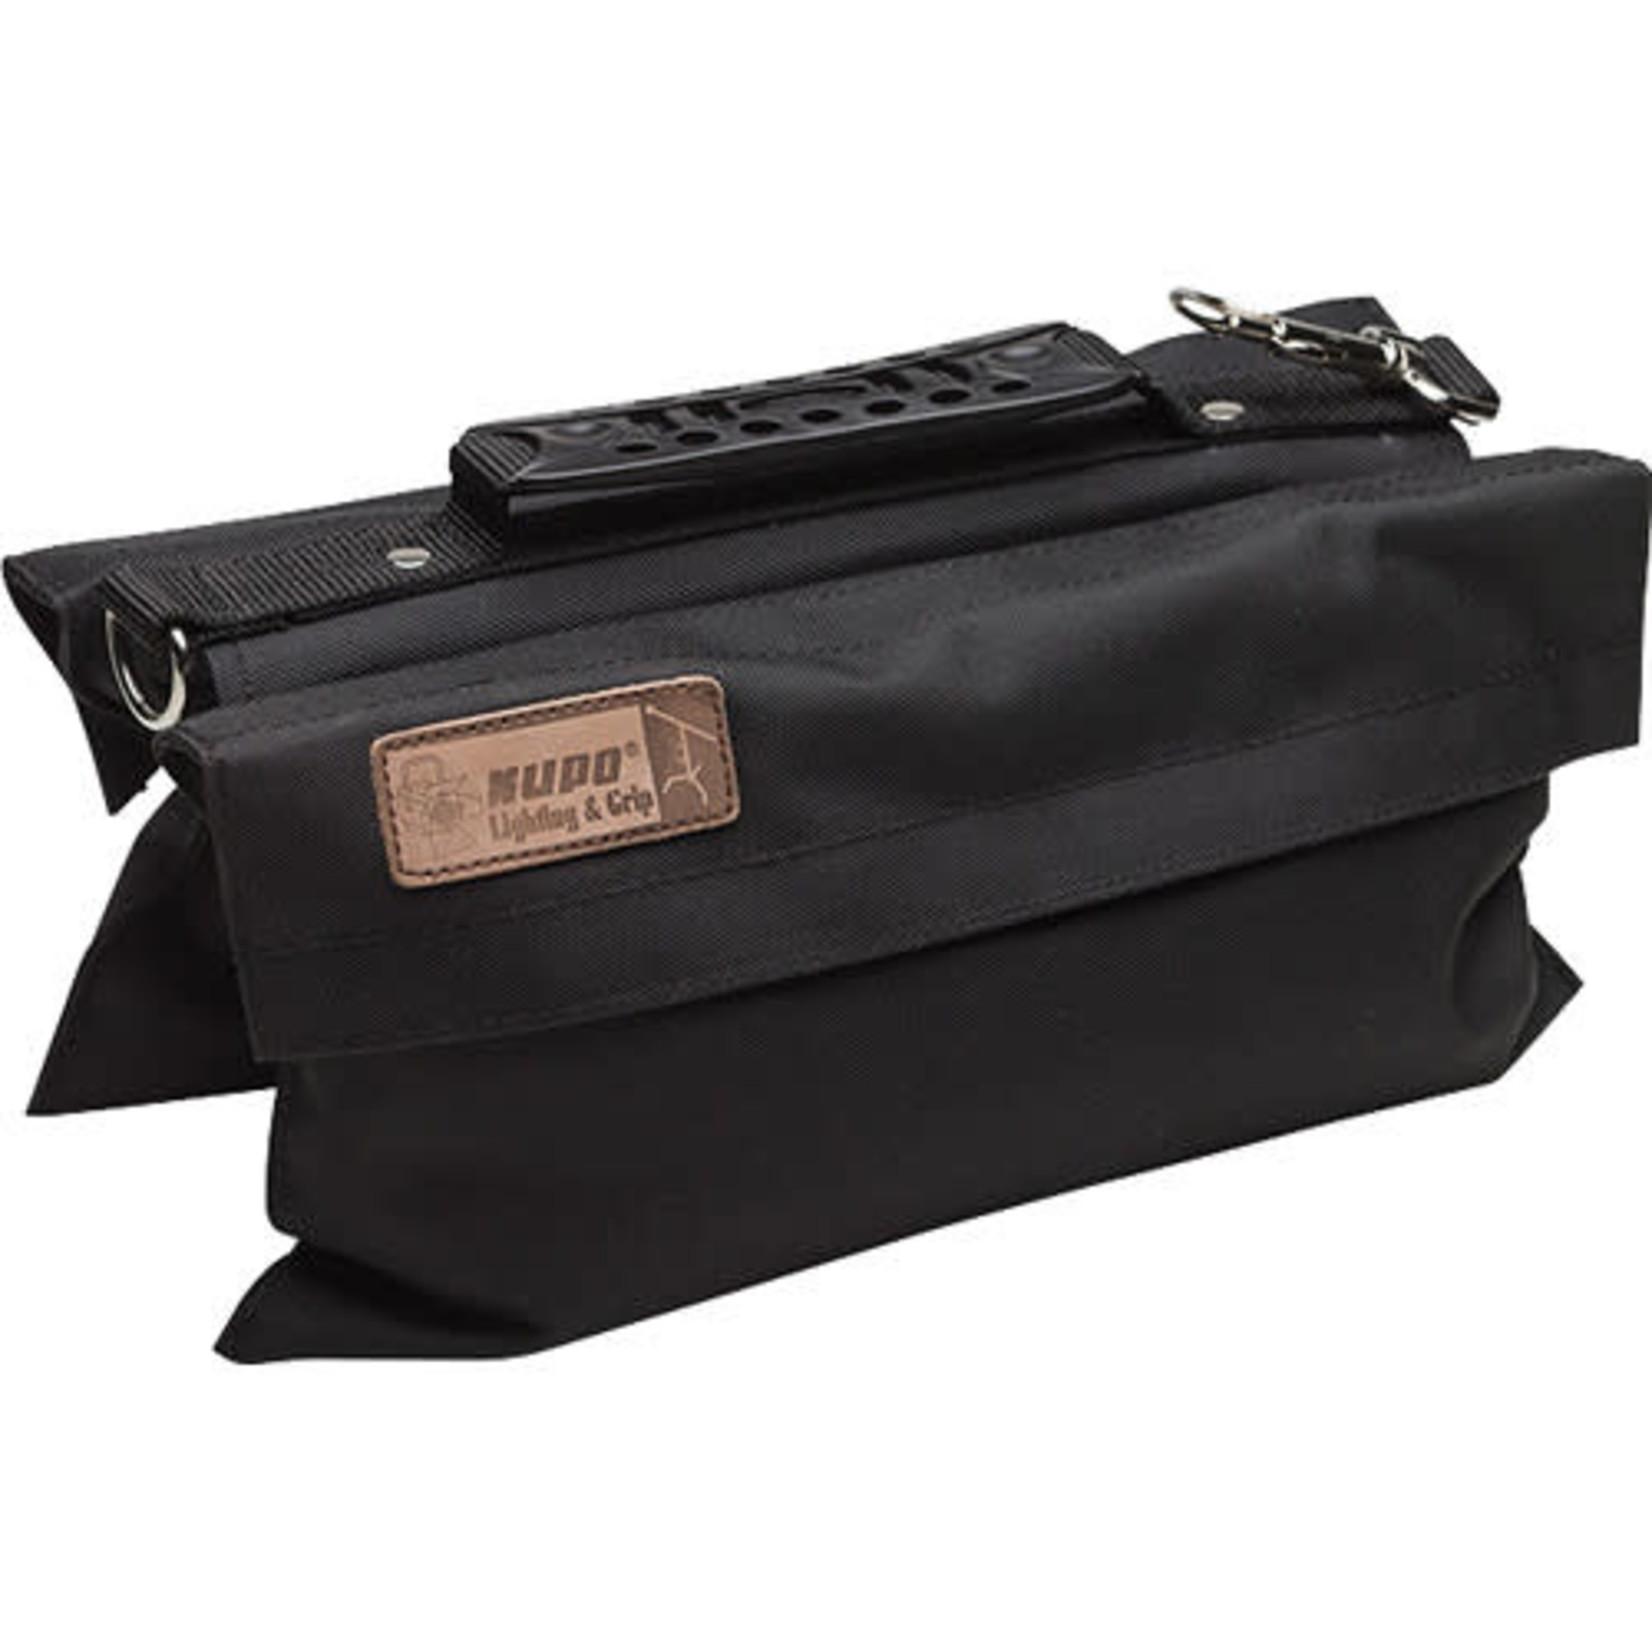 Kupo Kupo Touch-Fastener Empty Refillable Sandbag (13.2 lb, Black)